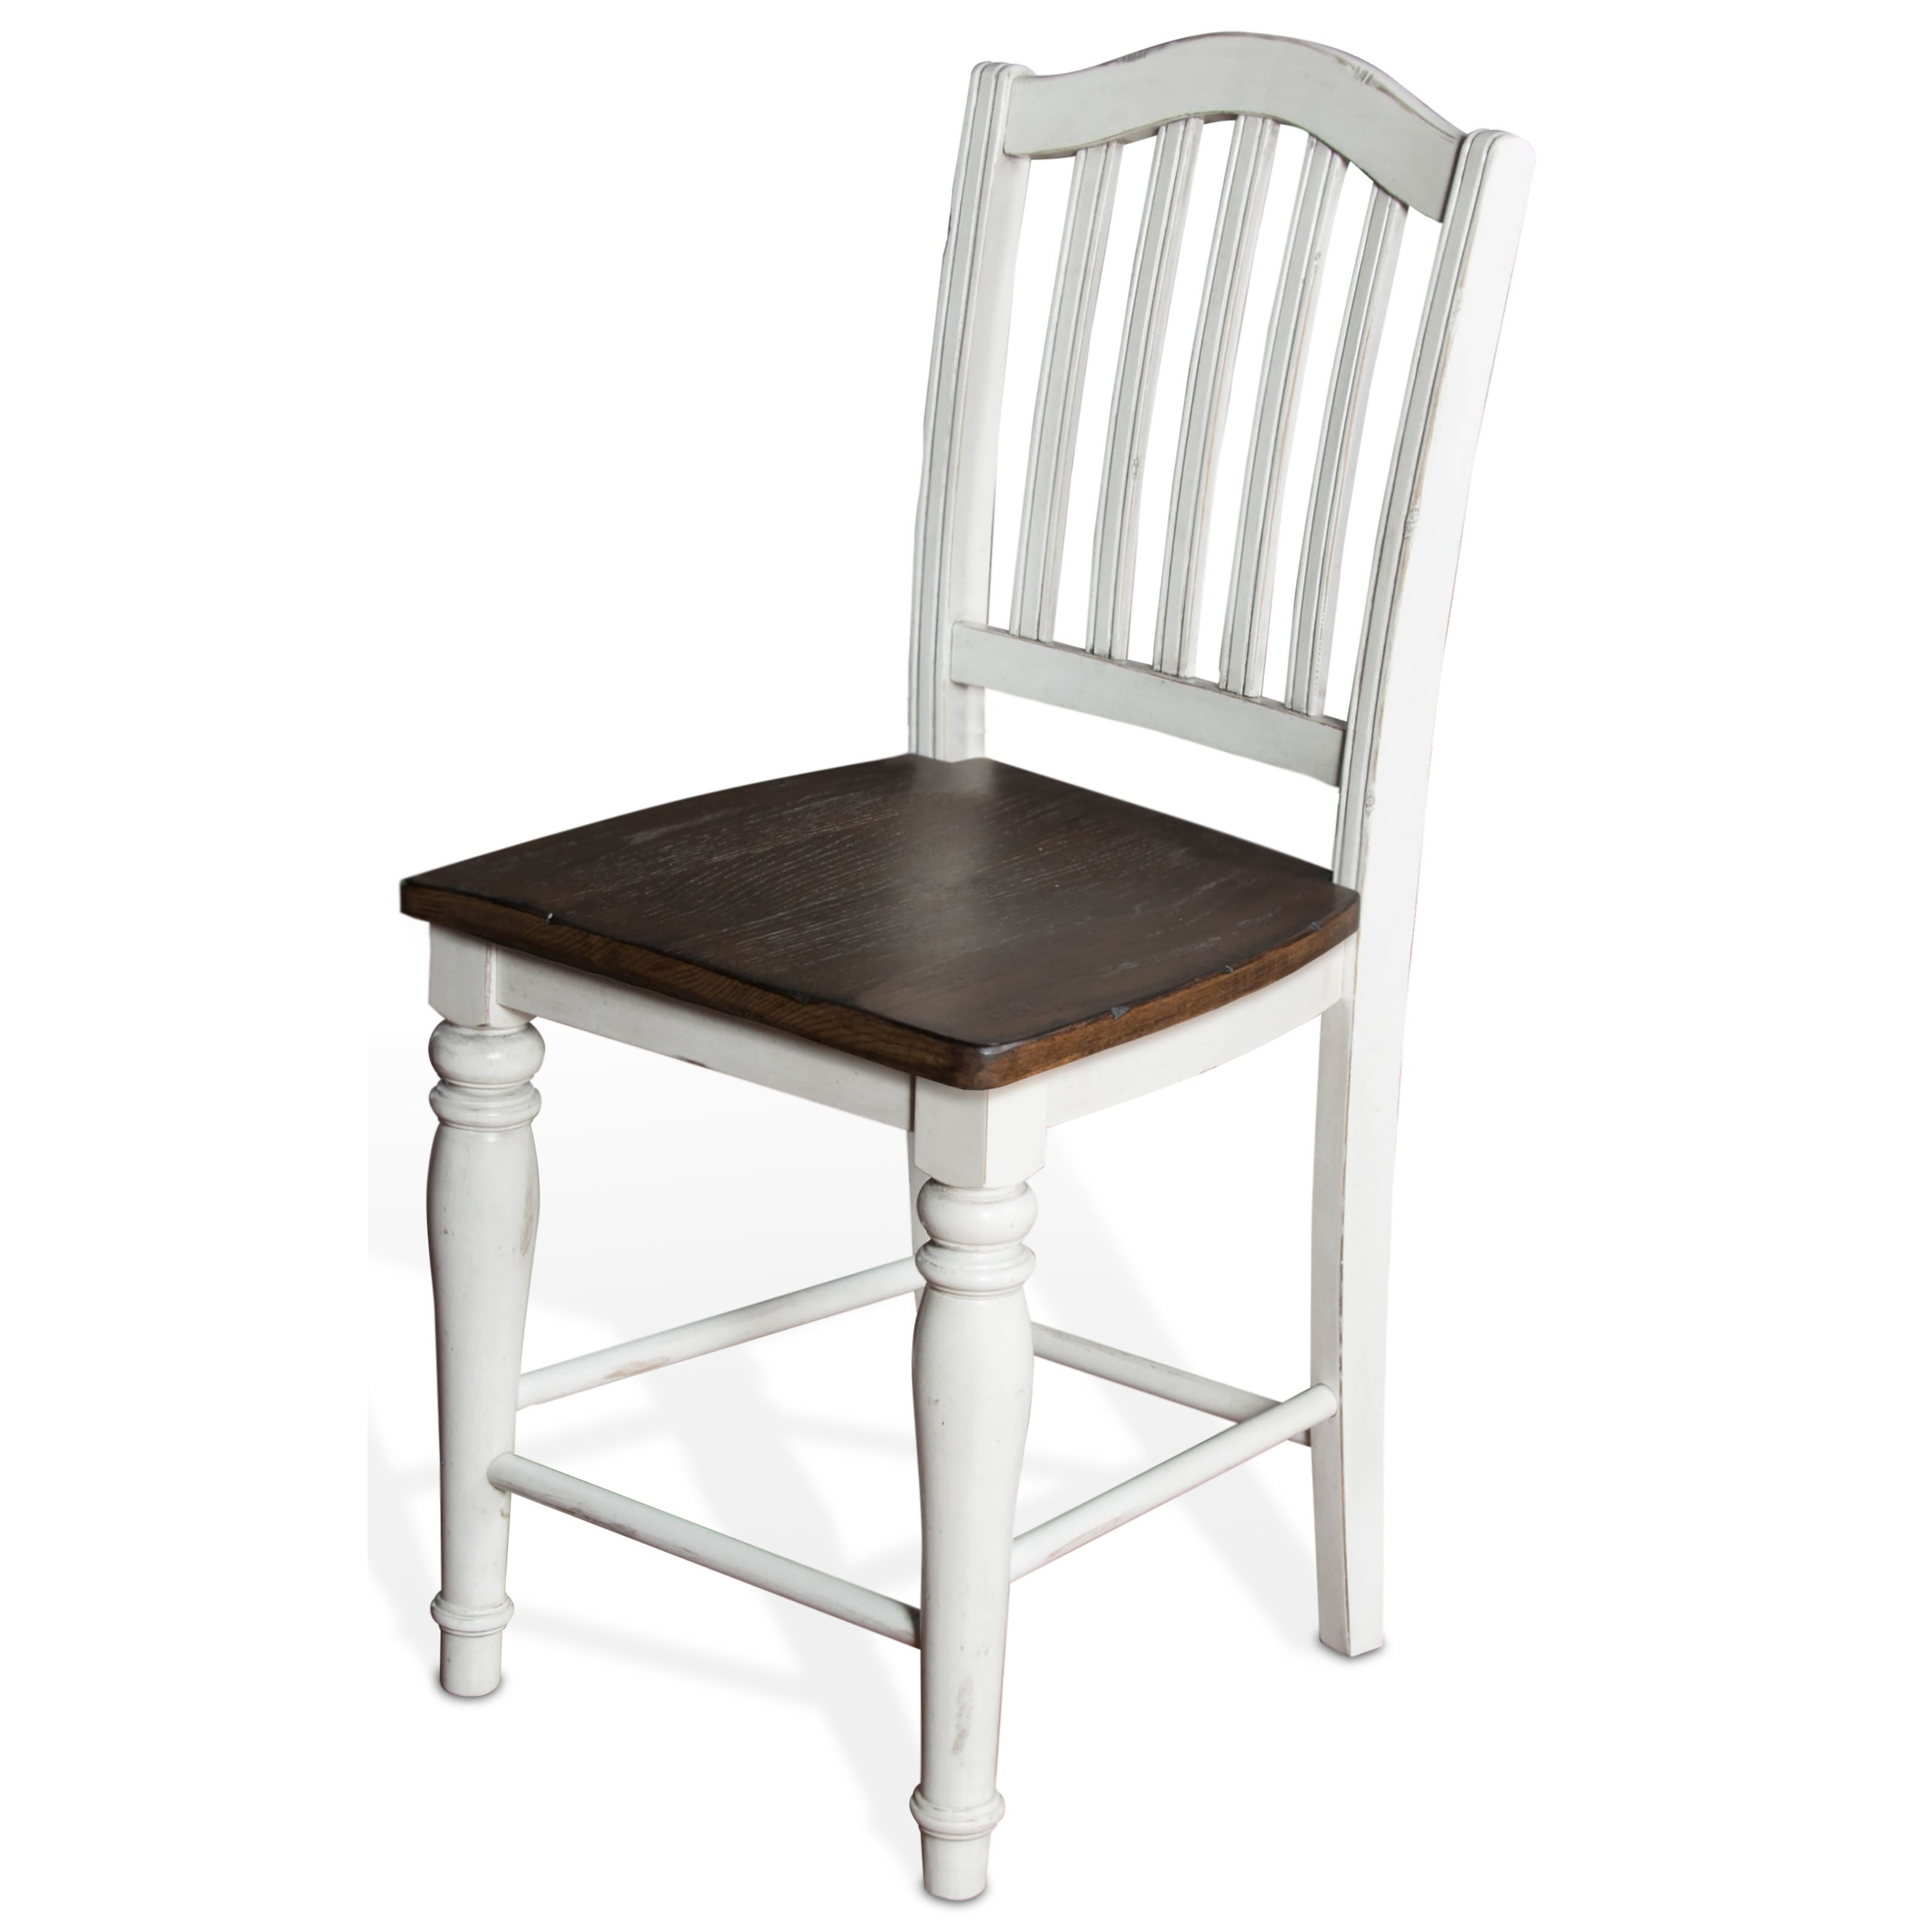 "24""H Slatback Stool w/ Wood Seat"